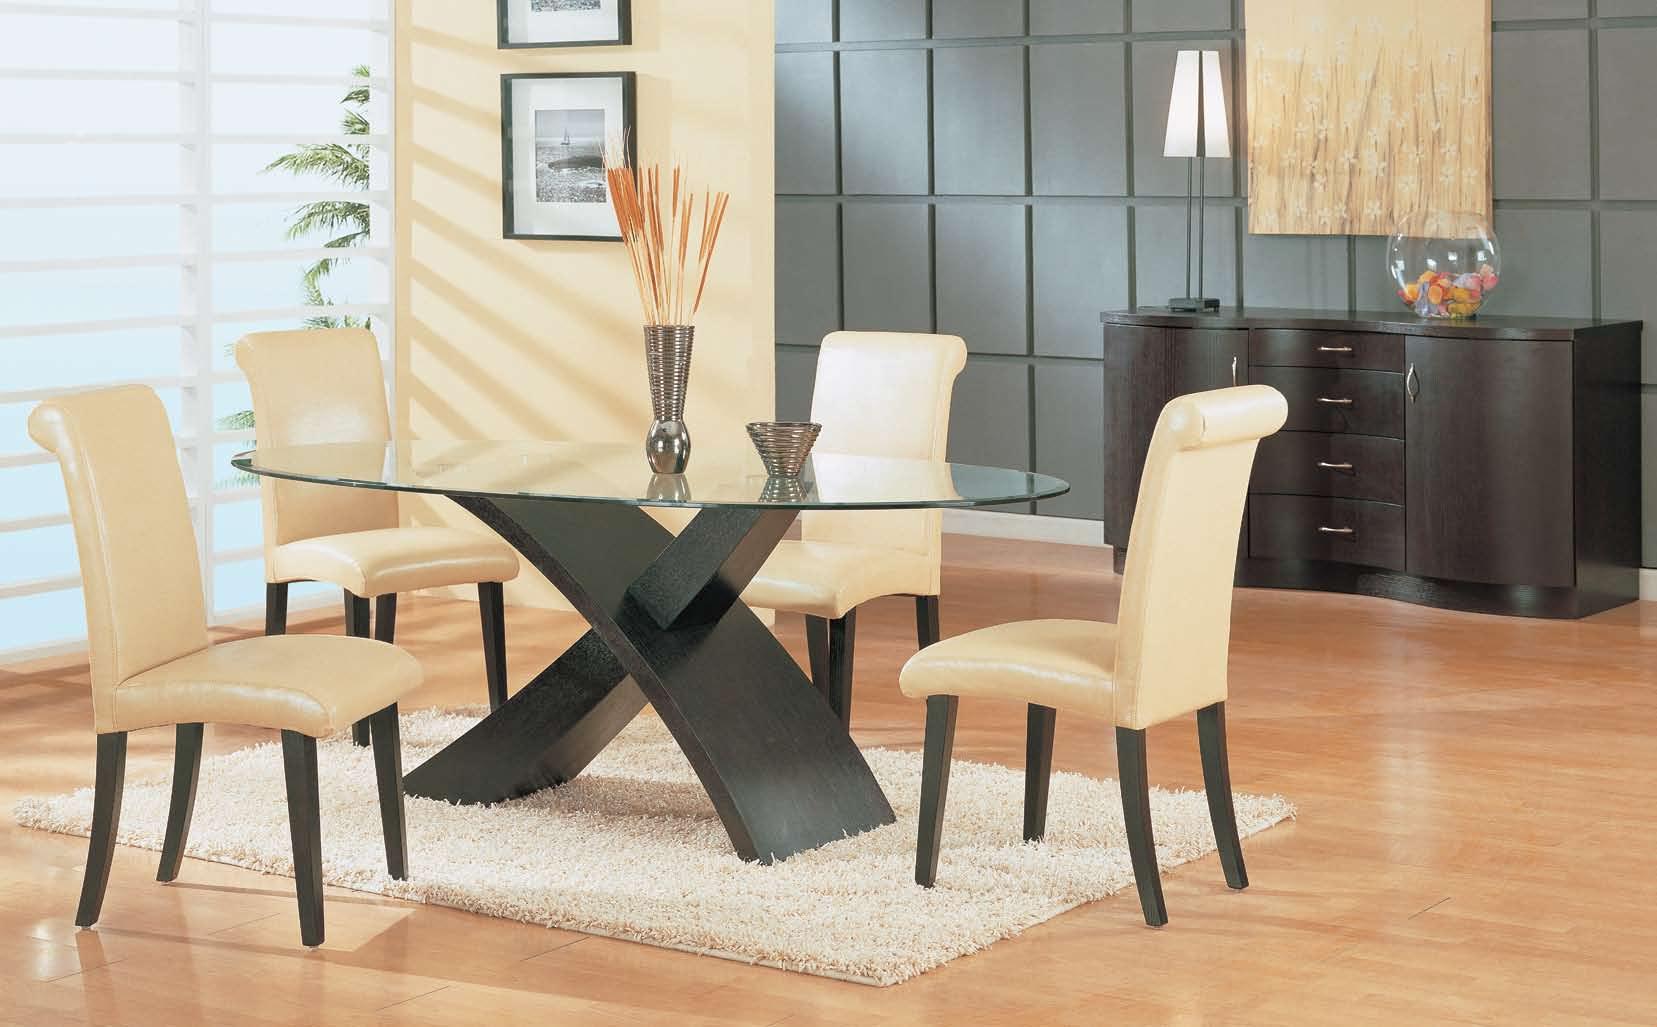 Global Furniture USA GF-G018 Dining Set - Beige